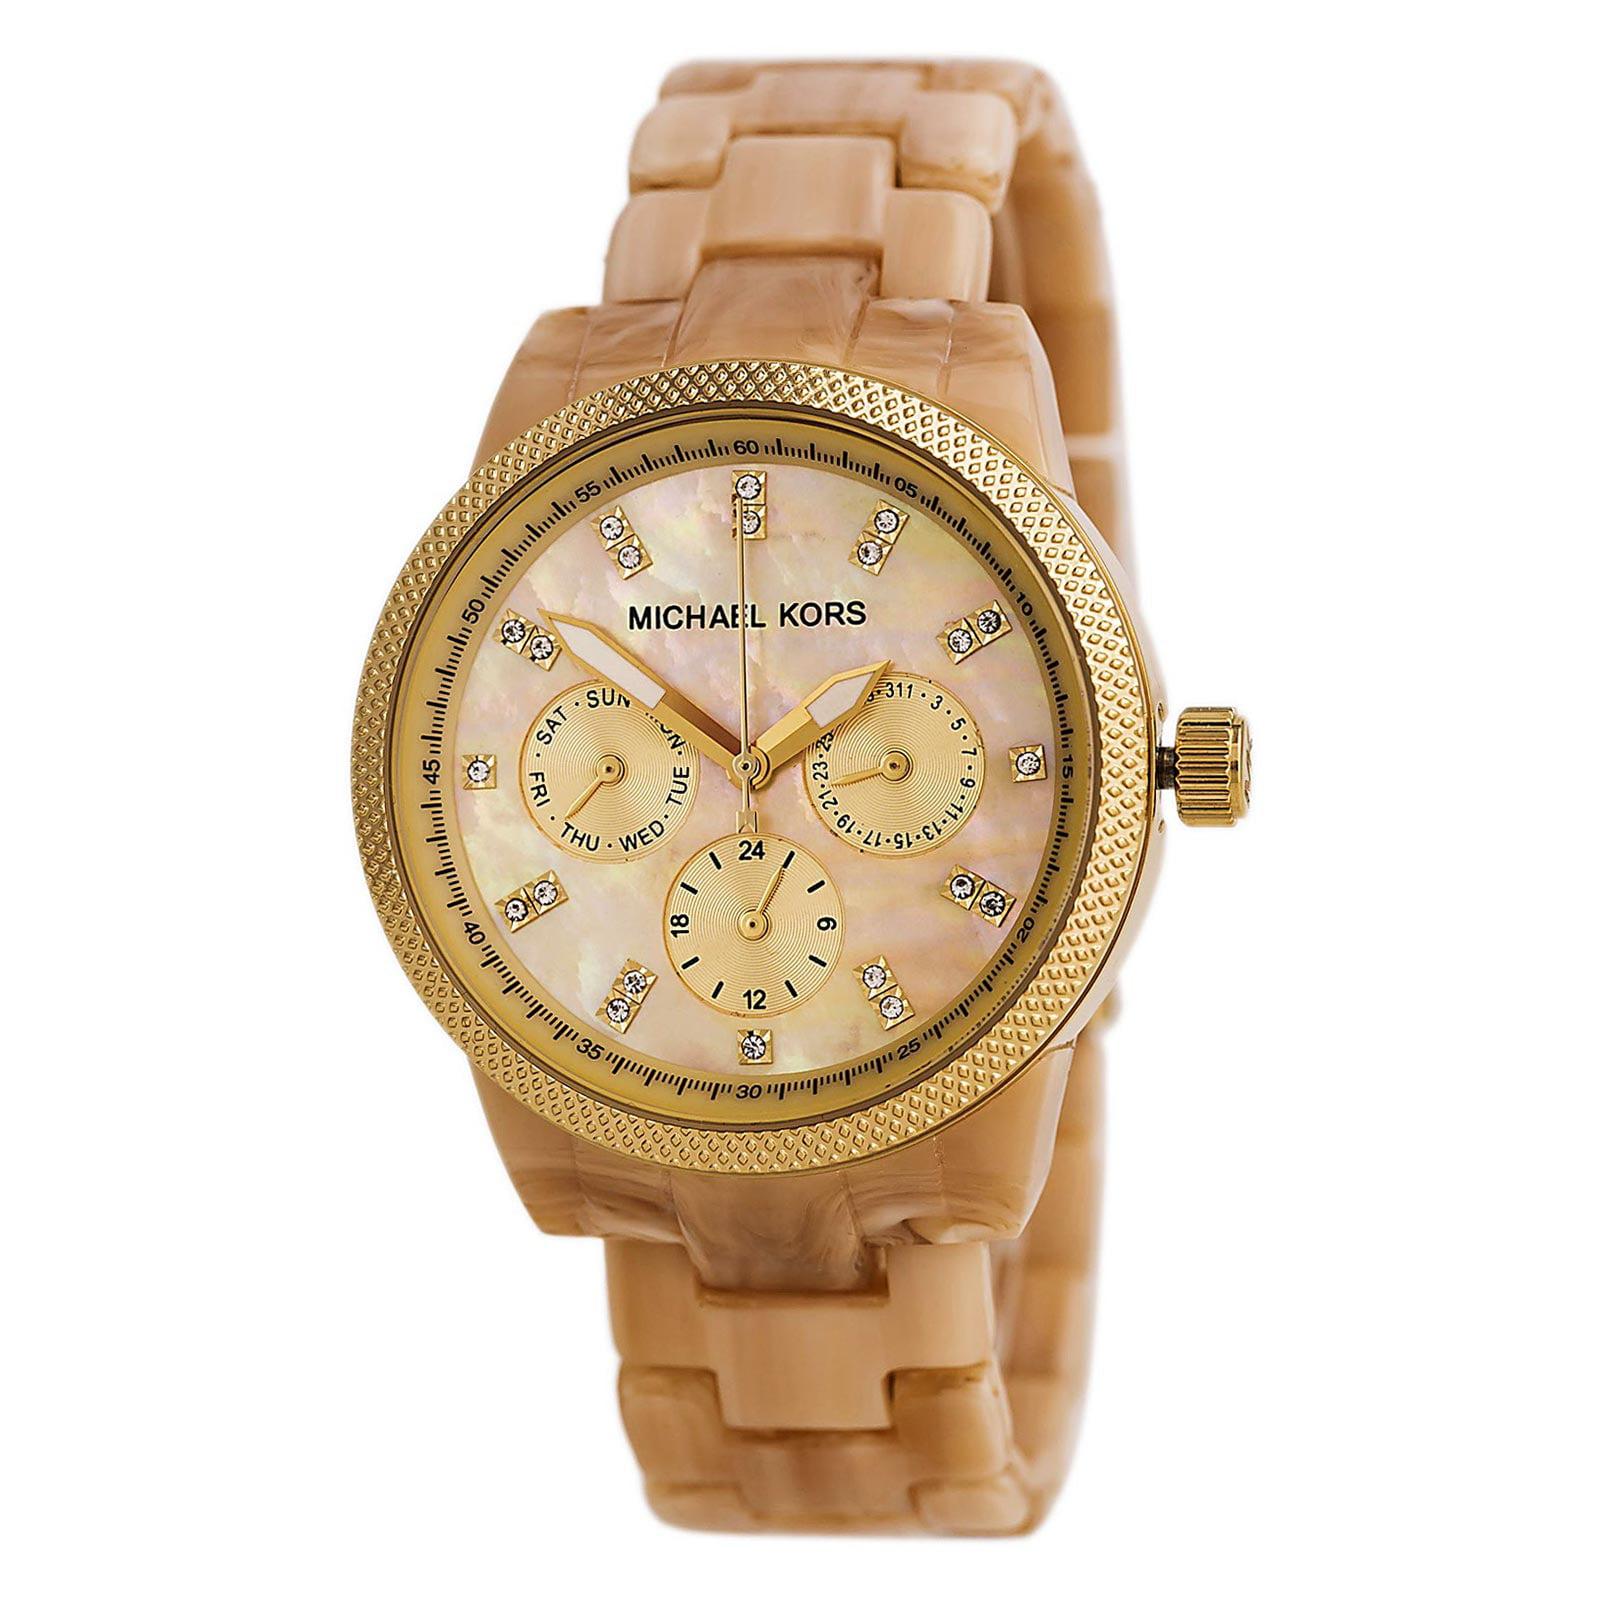 Michael Kors MK5039 Women's Mother of Pearl Gold Tone Watch